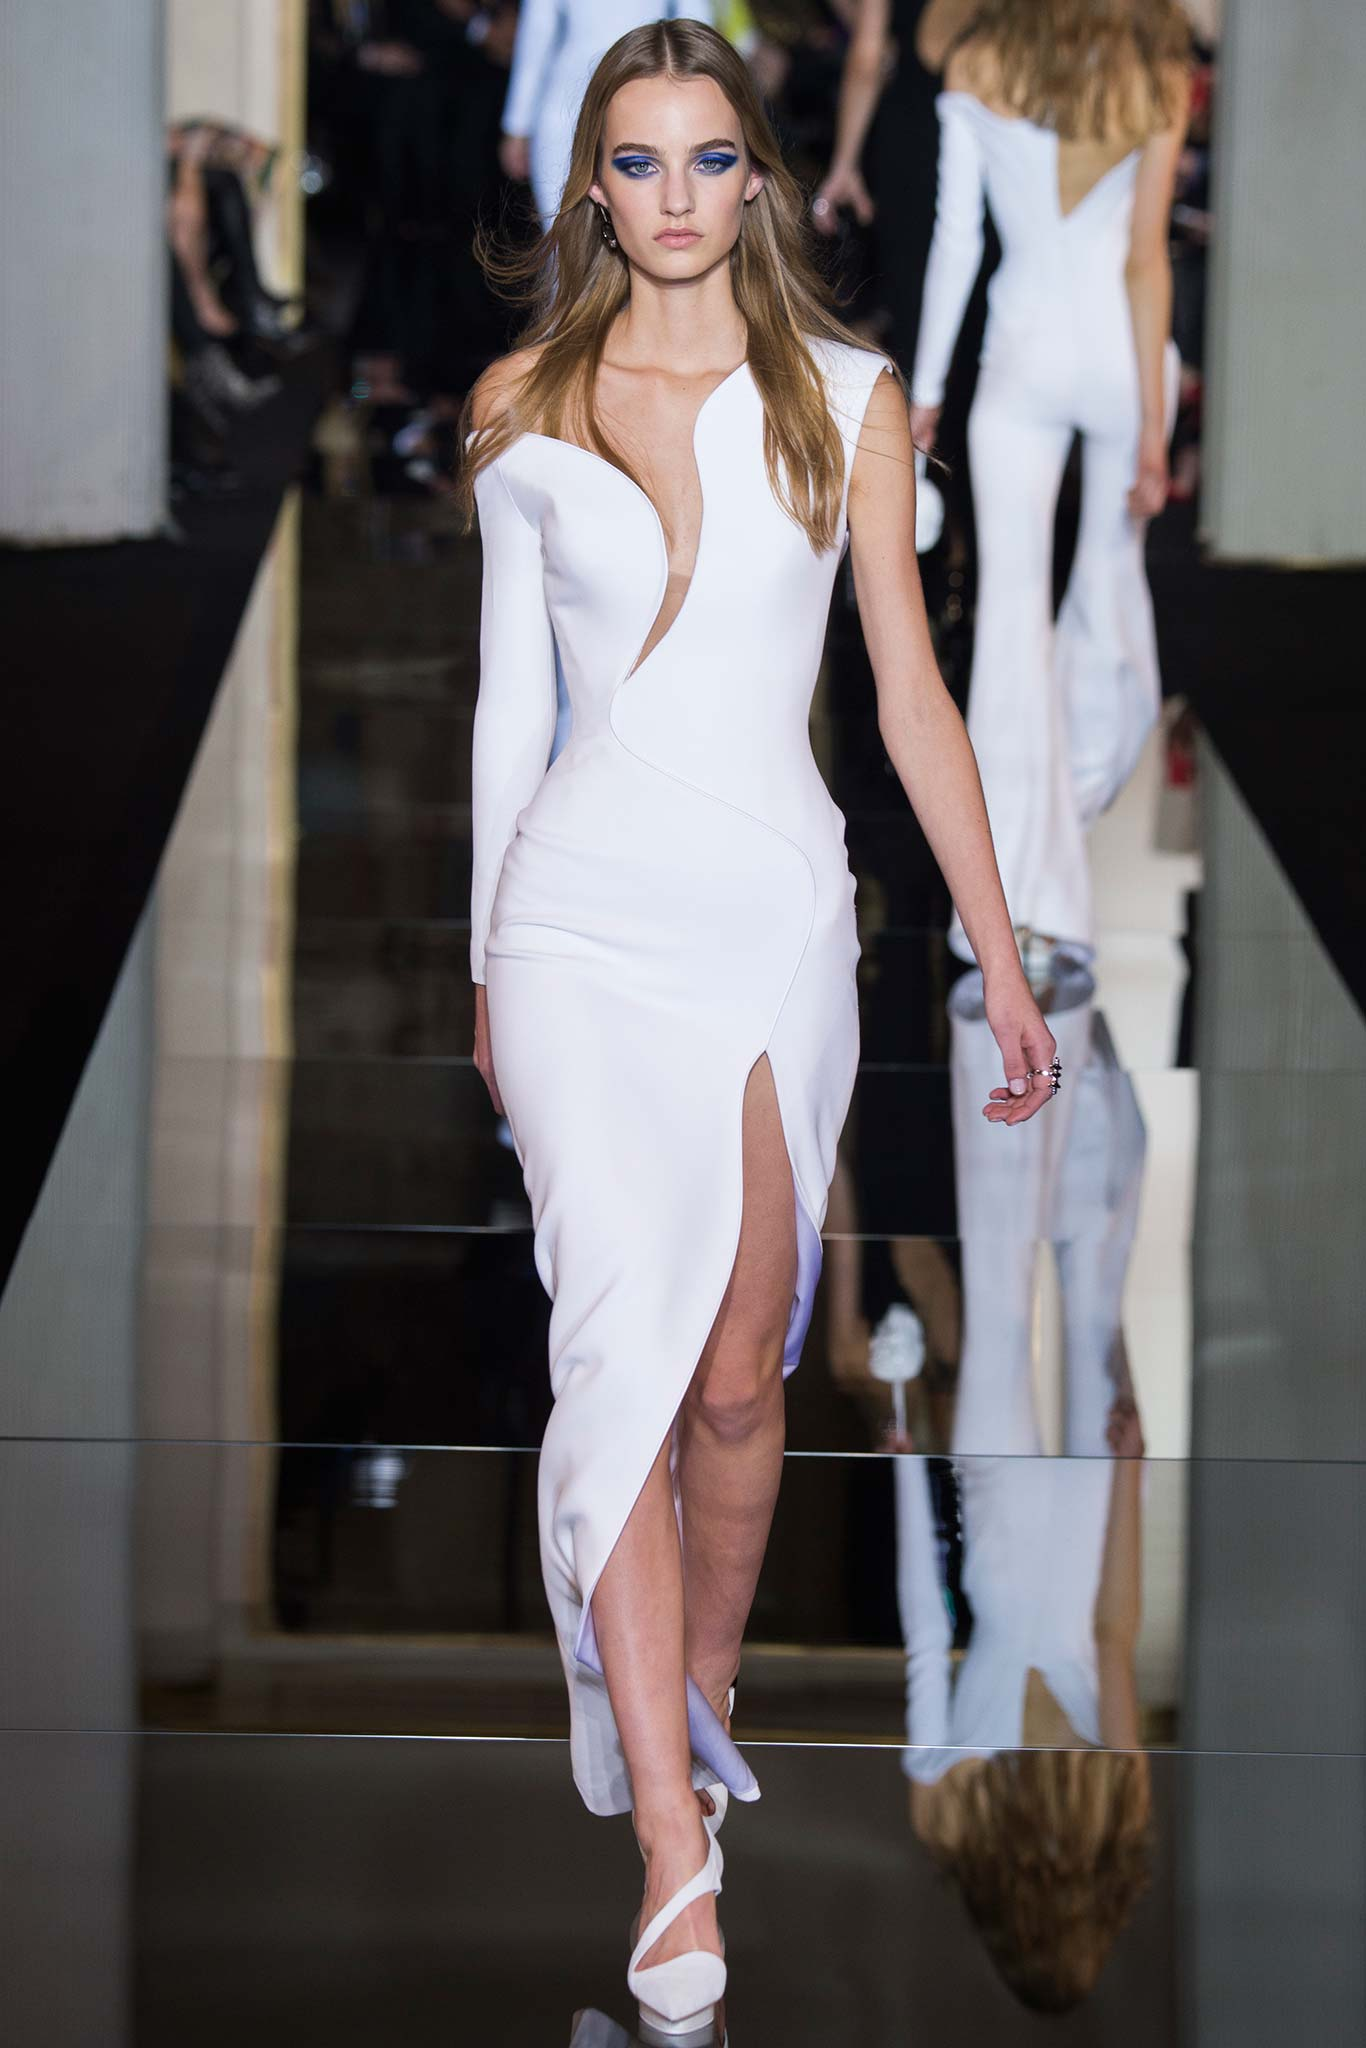 Paris Spring 2015 Couture: Atelier Versace – Ani & Izzy